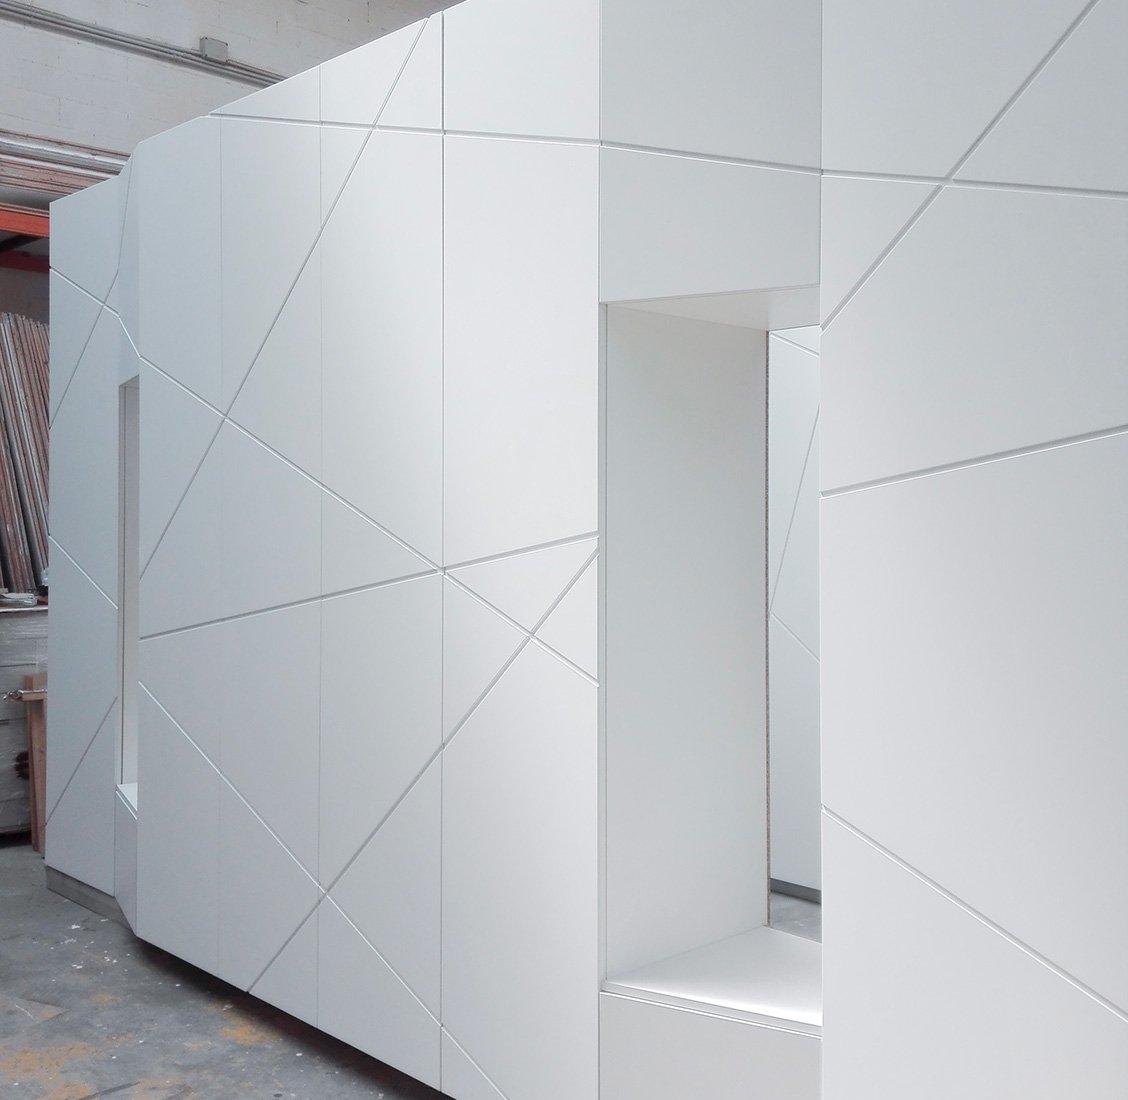 Armadio diagonali6 1 Raffaeli Design